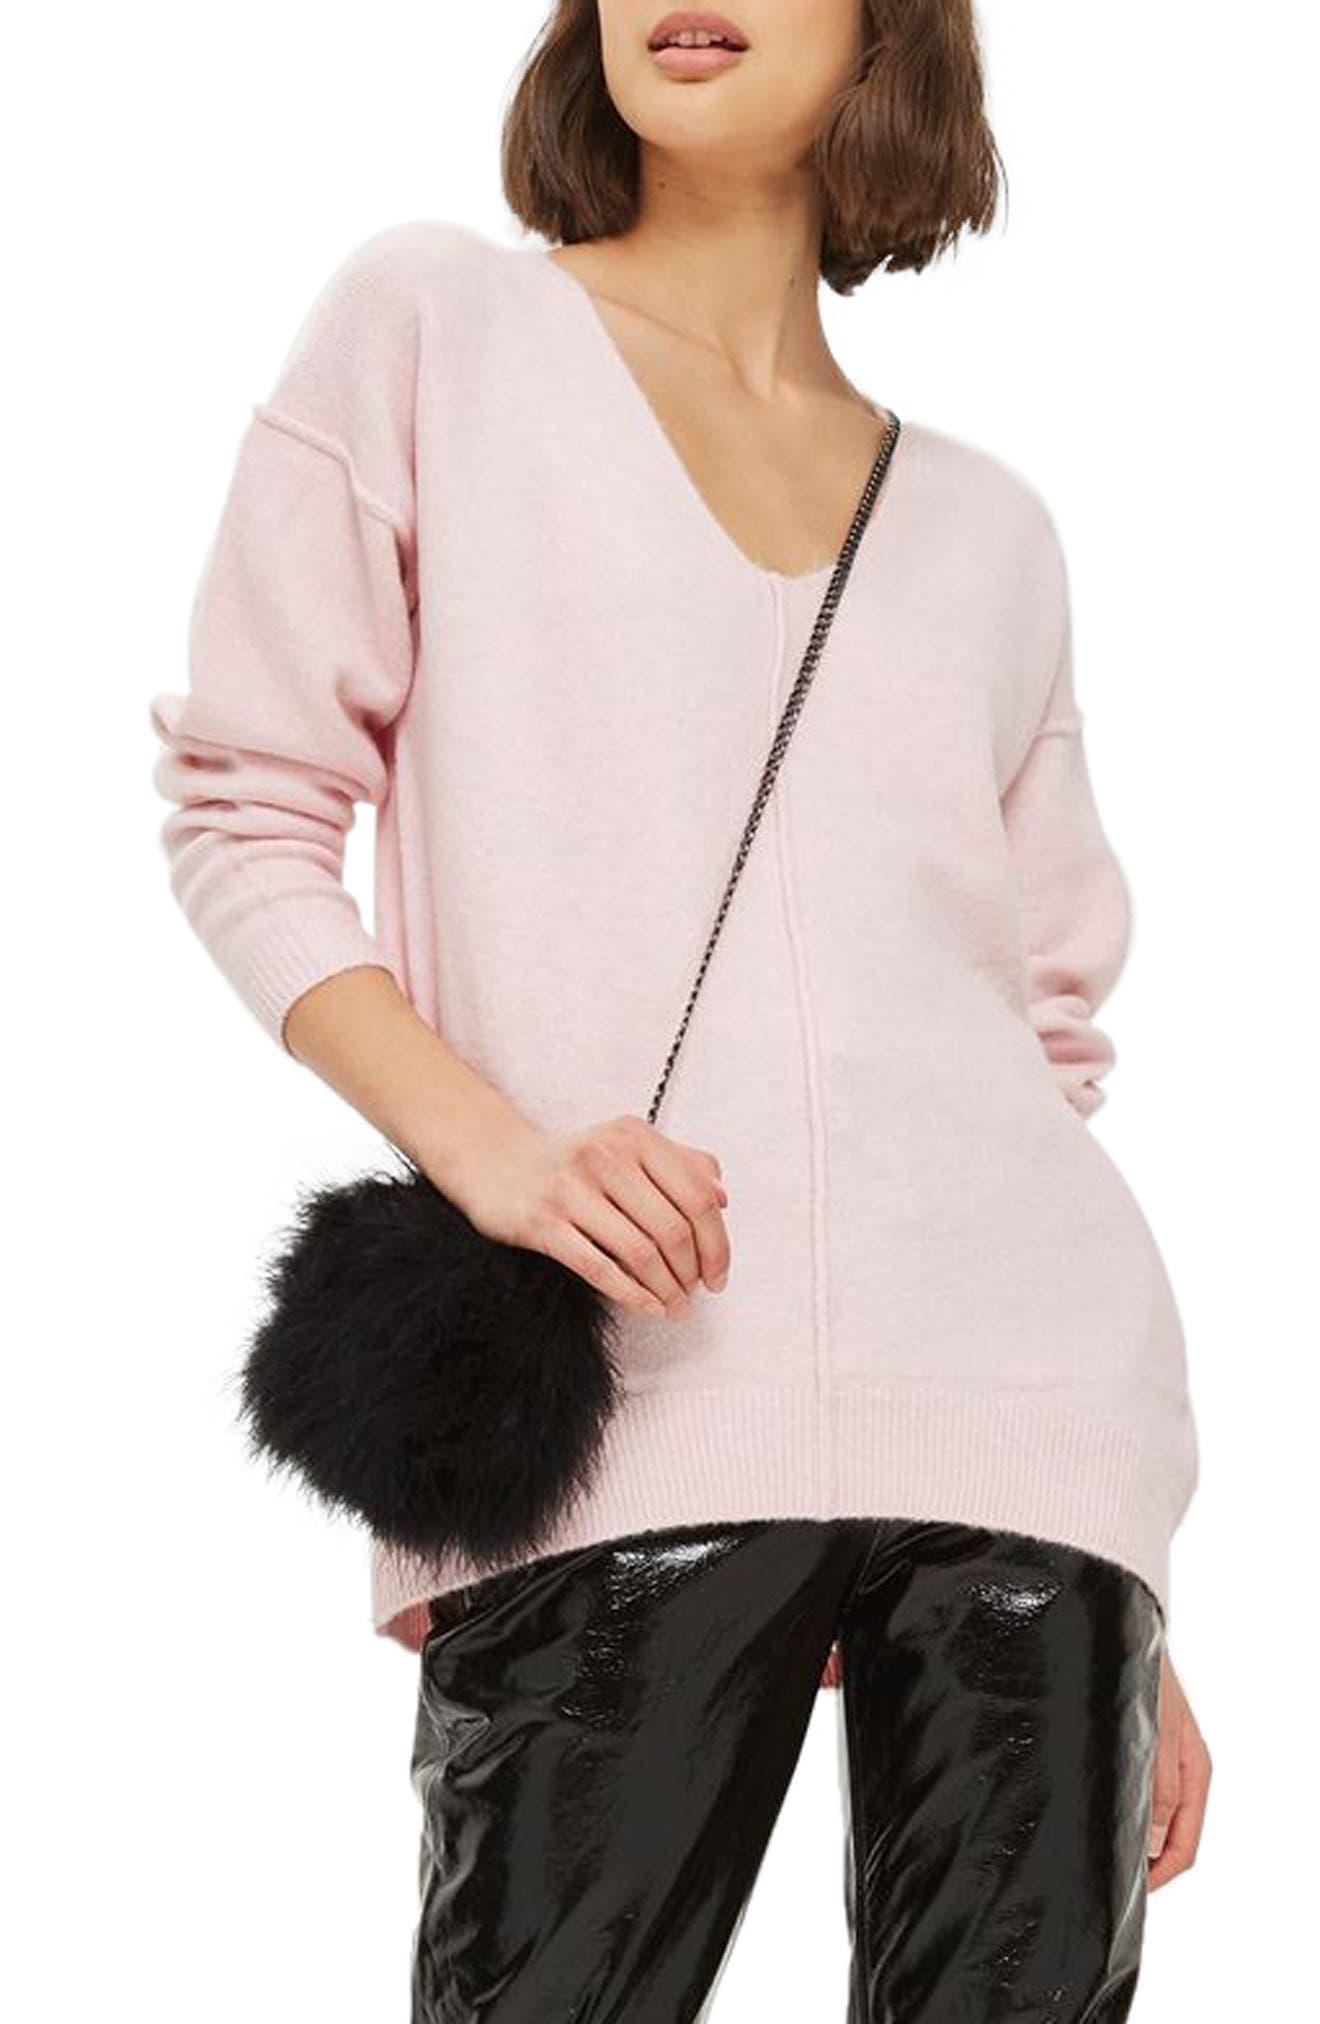 Topshop Exposed Seam Longline Sweater